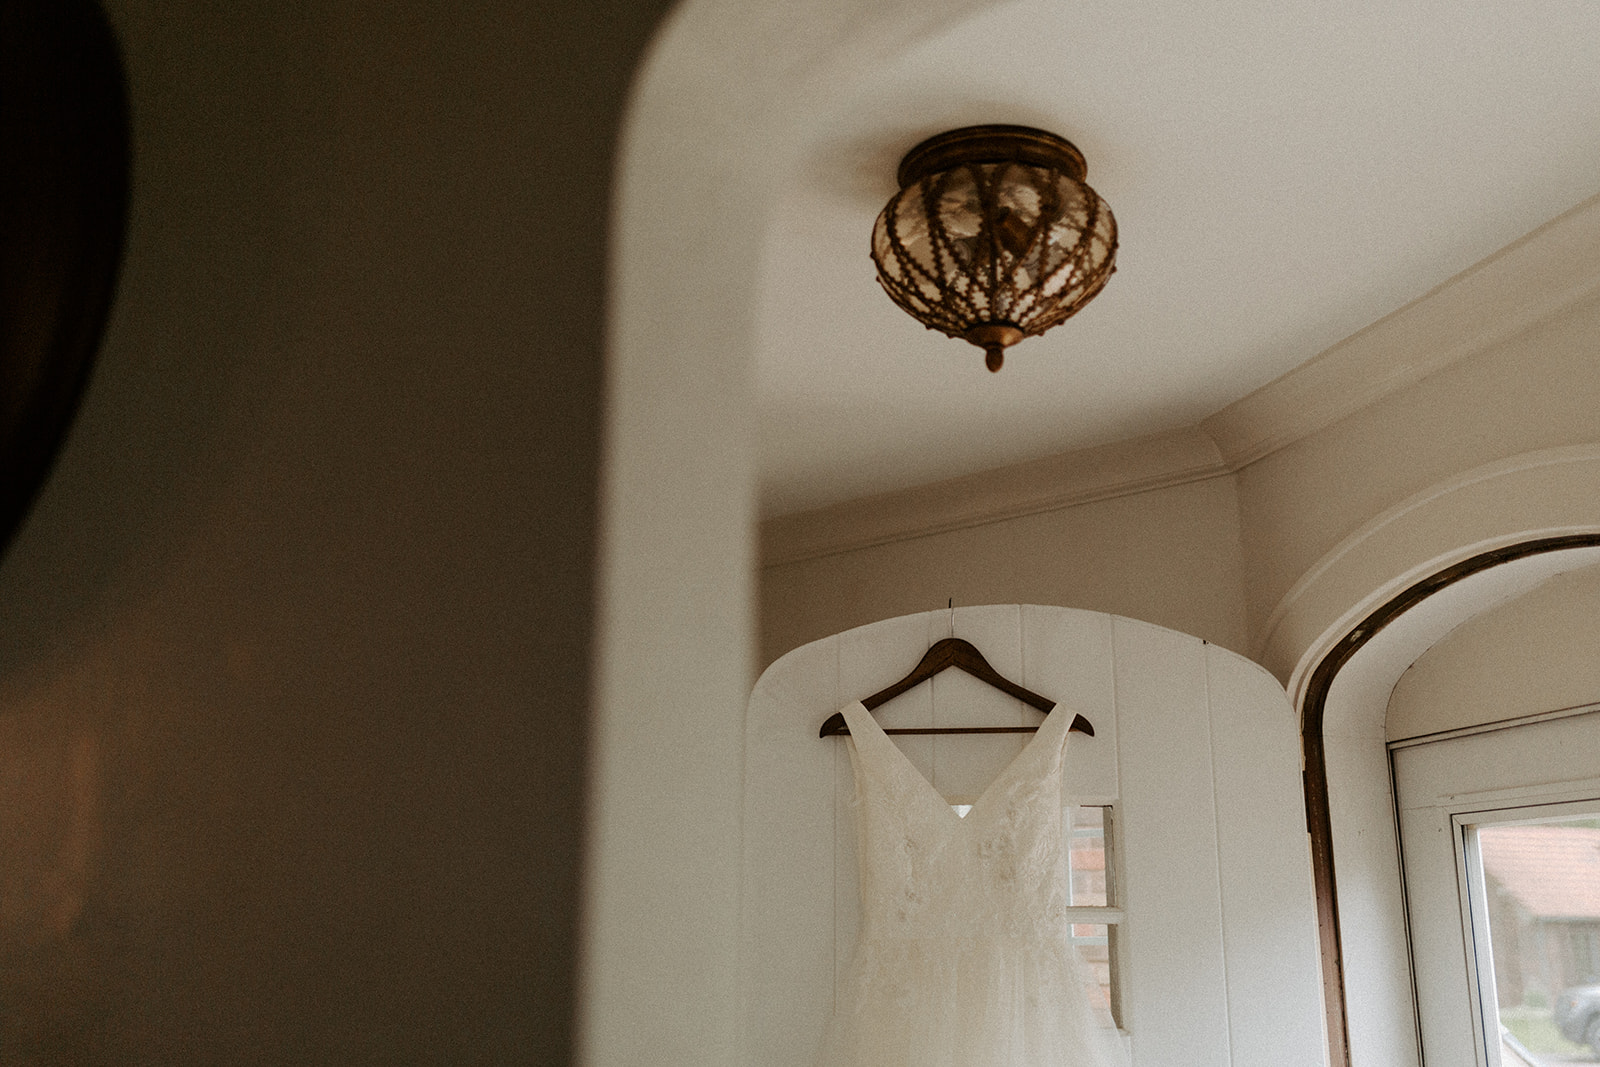 camp_wokanda_peoria_illinois_wedding_photographer_wright_photographs_bliese_0027.jpg